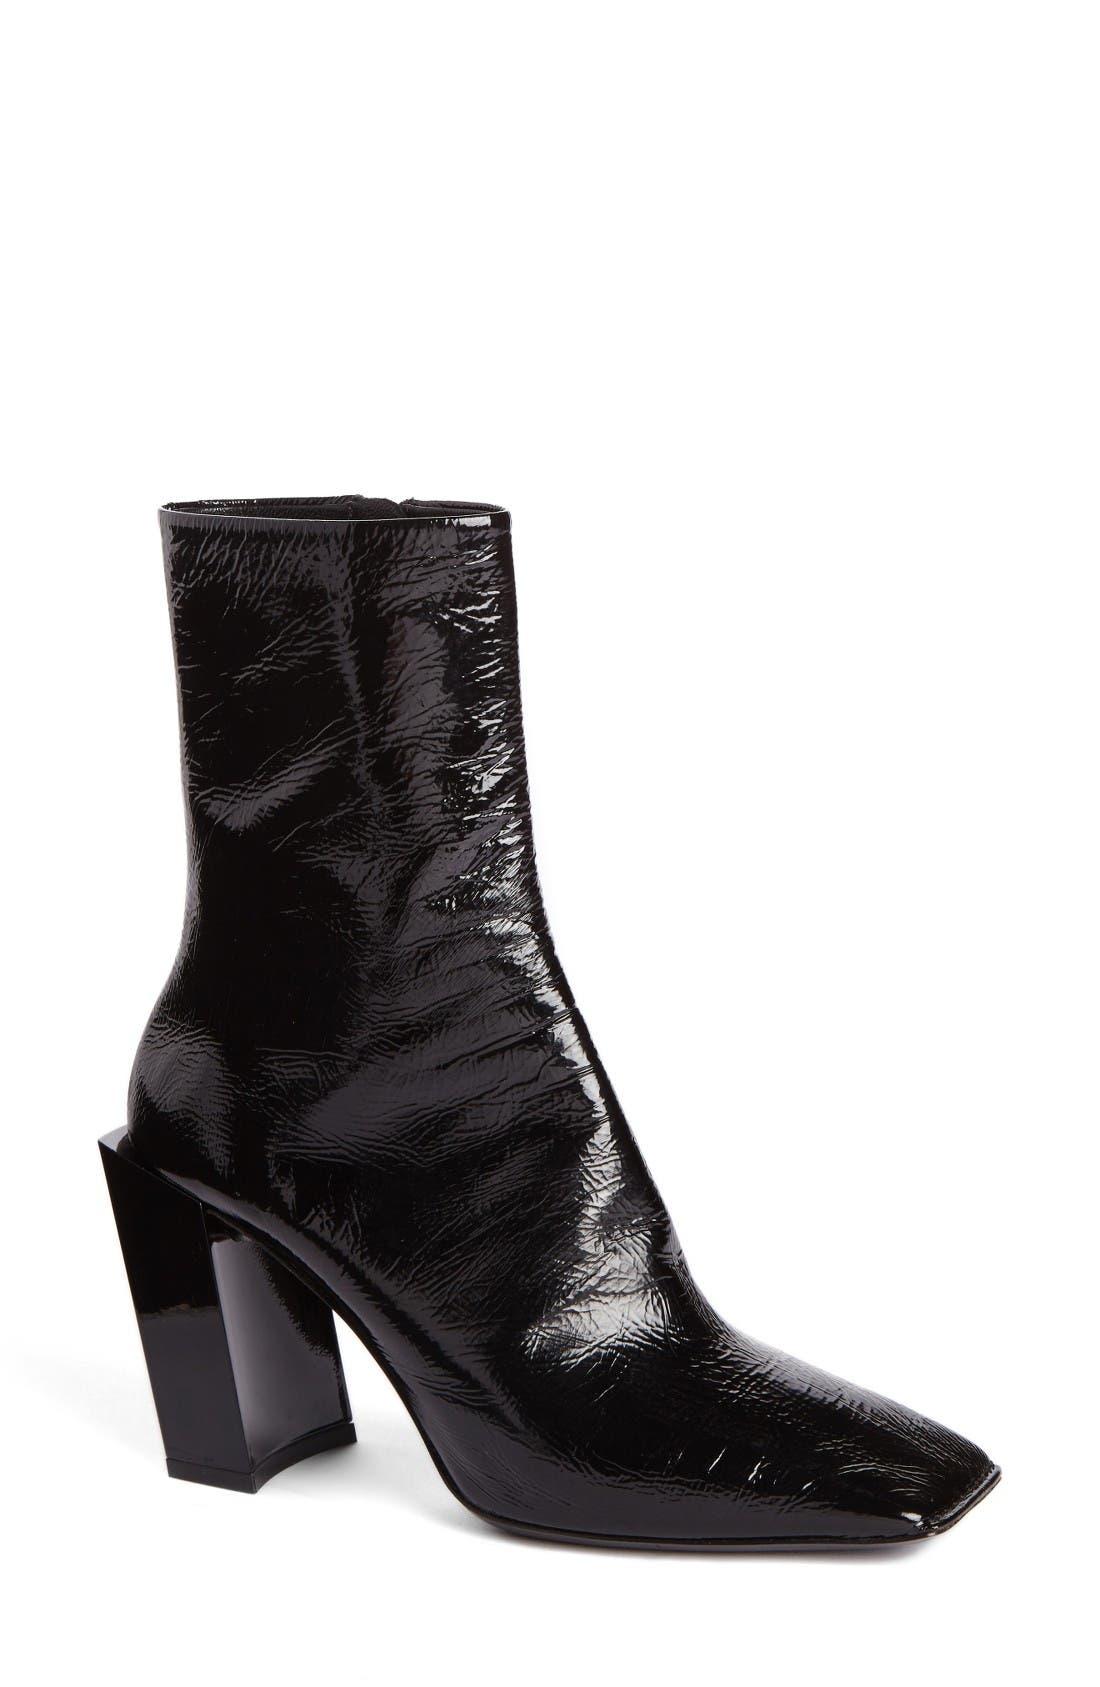 Alternate Image 1 Selected - Balenciaga Square Toe Boot (Women)